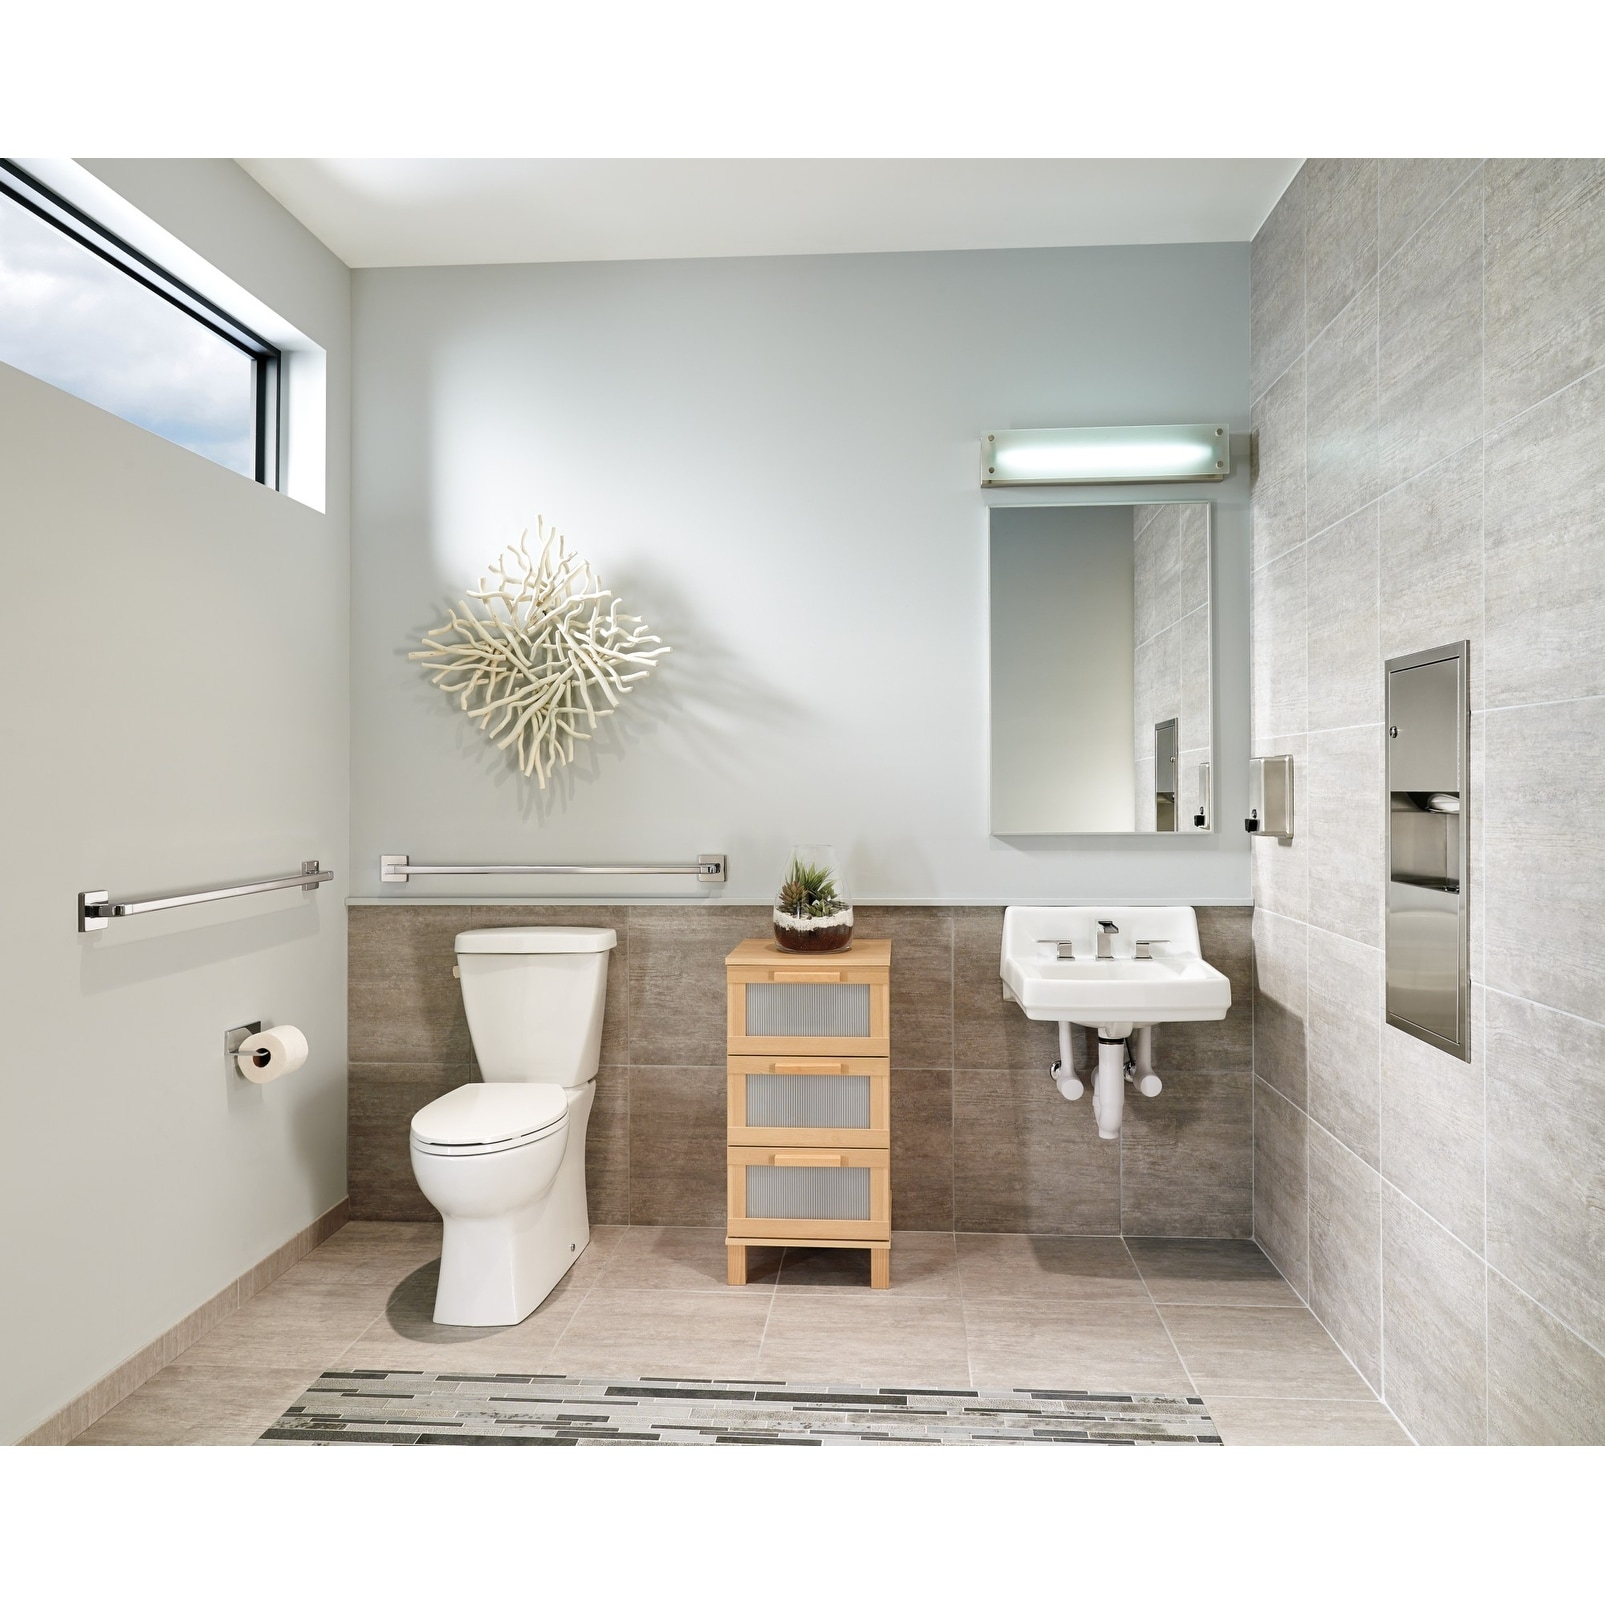 delta 3568lf mpu ara 1 2 gpm widespread waterfall bathroom faucet